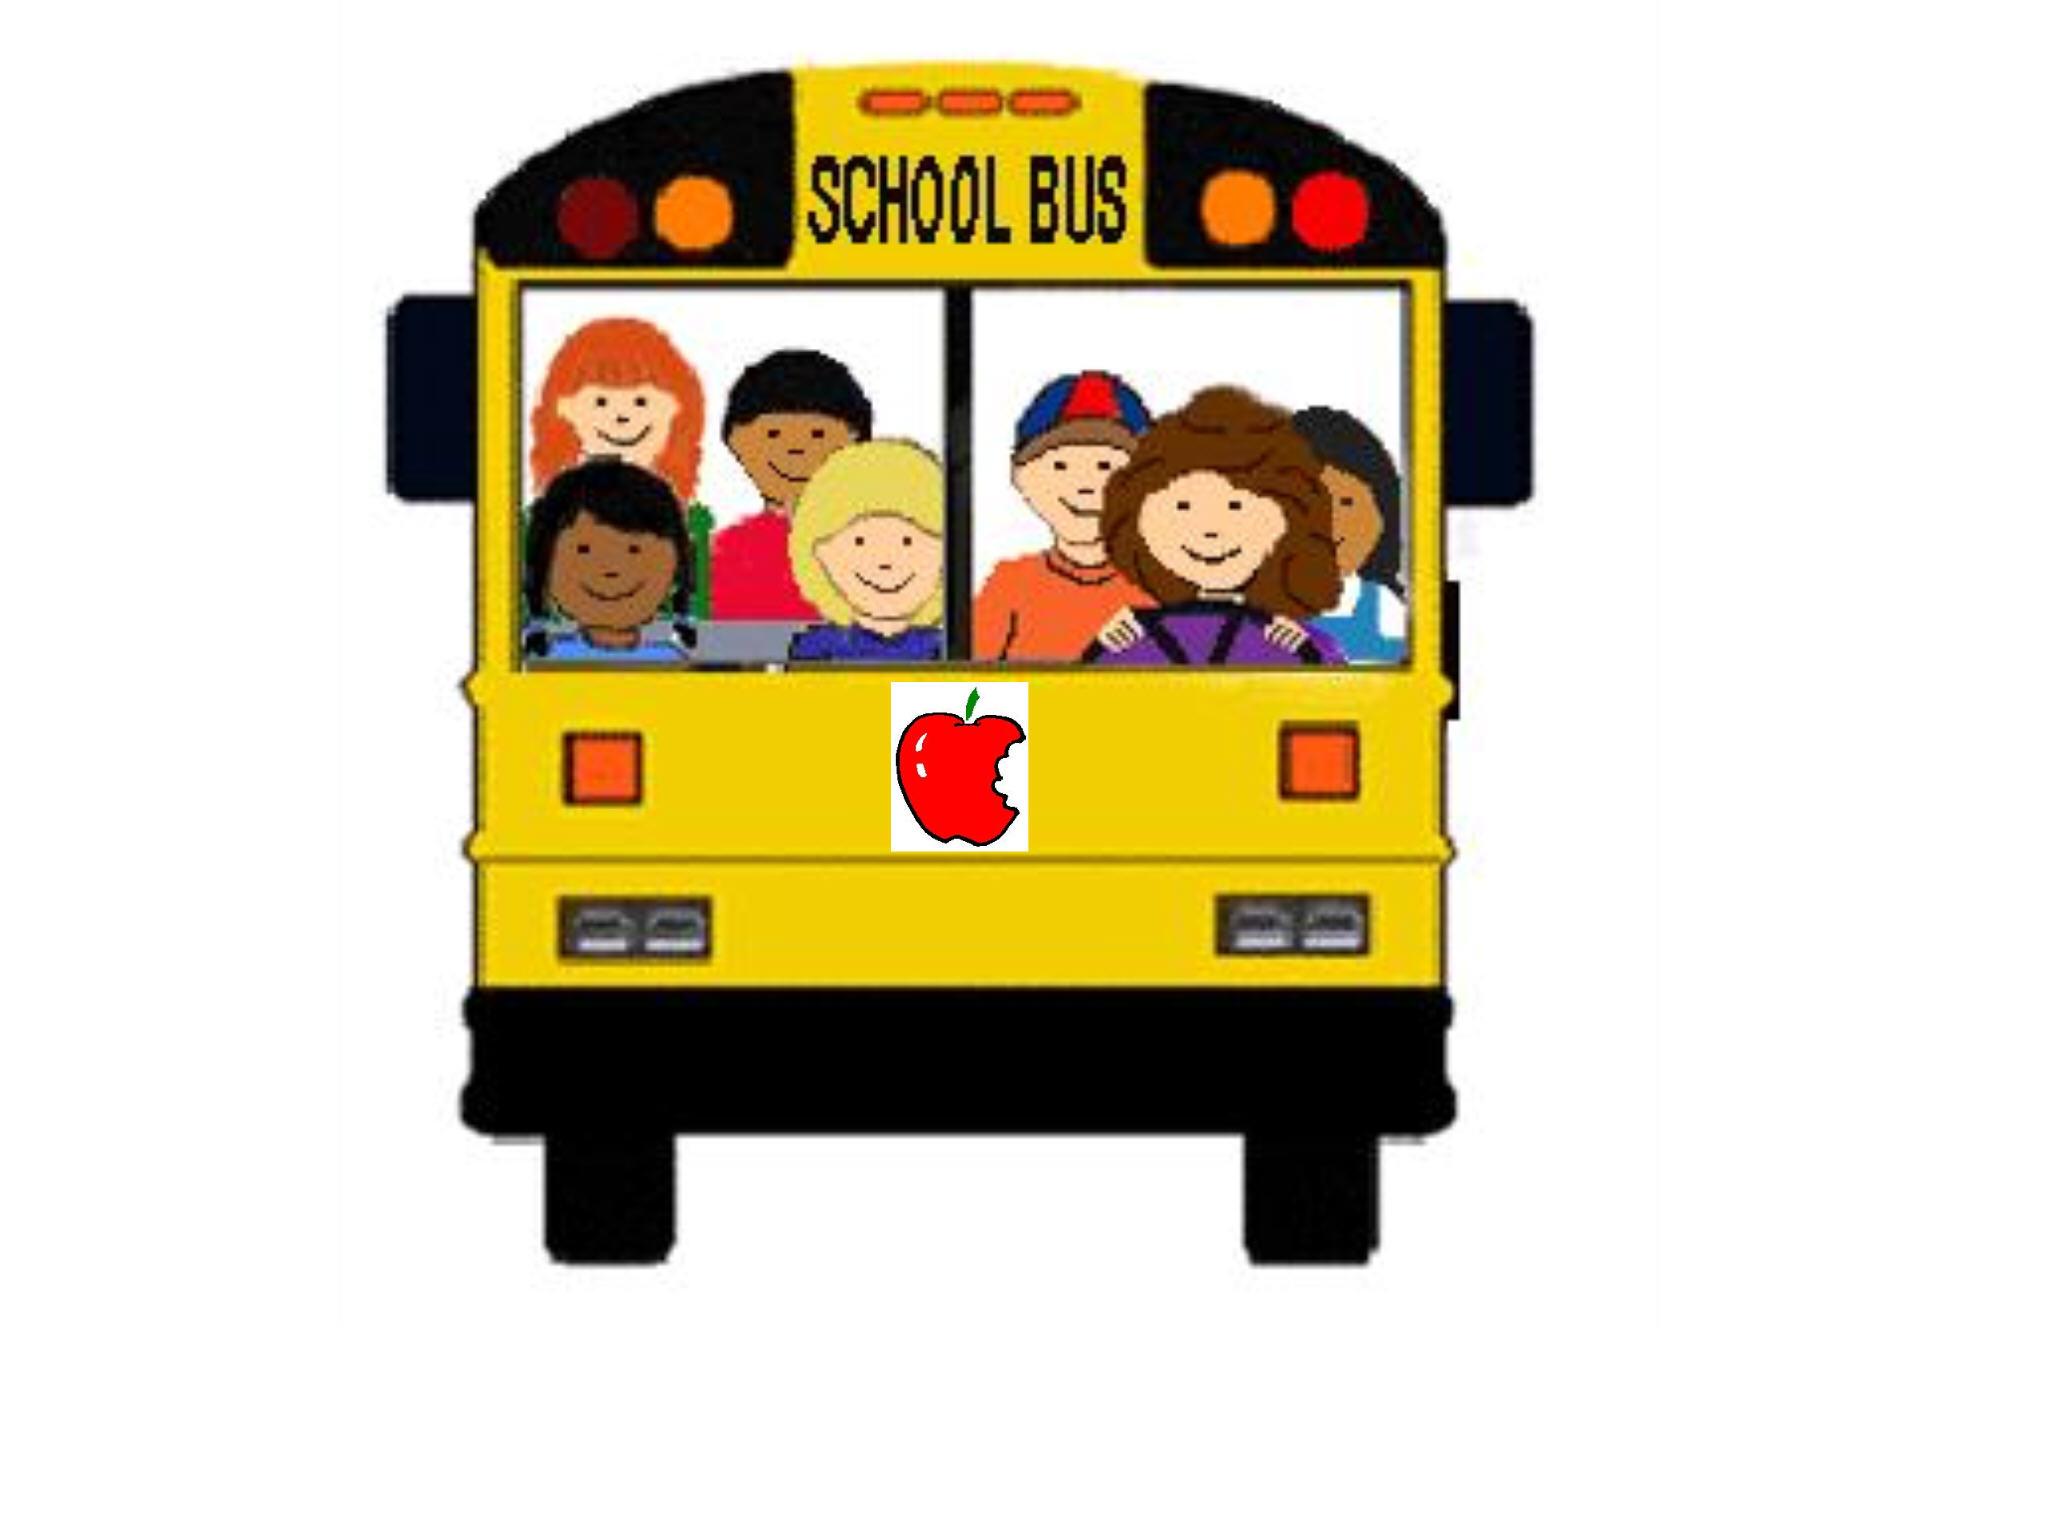 2048x1536 School Bus Clip Art For Kids Clipart Panda